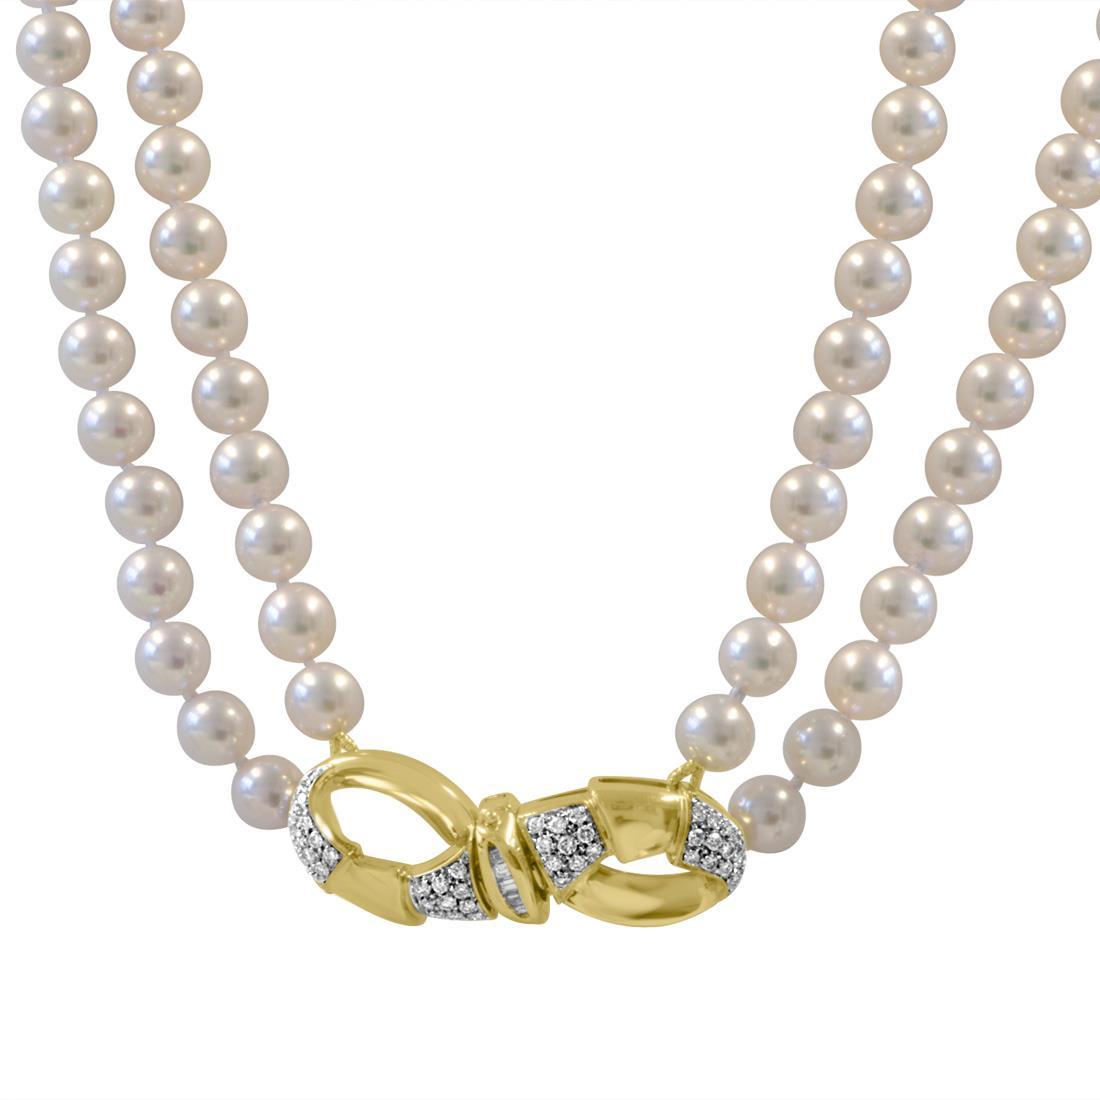 Collana Oro & Co con perle Akoya Giapponesi 7-7,5 mm - ORO&CO